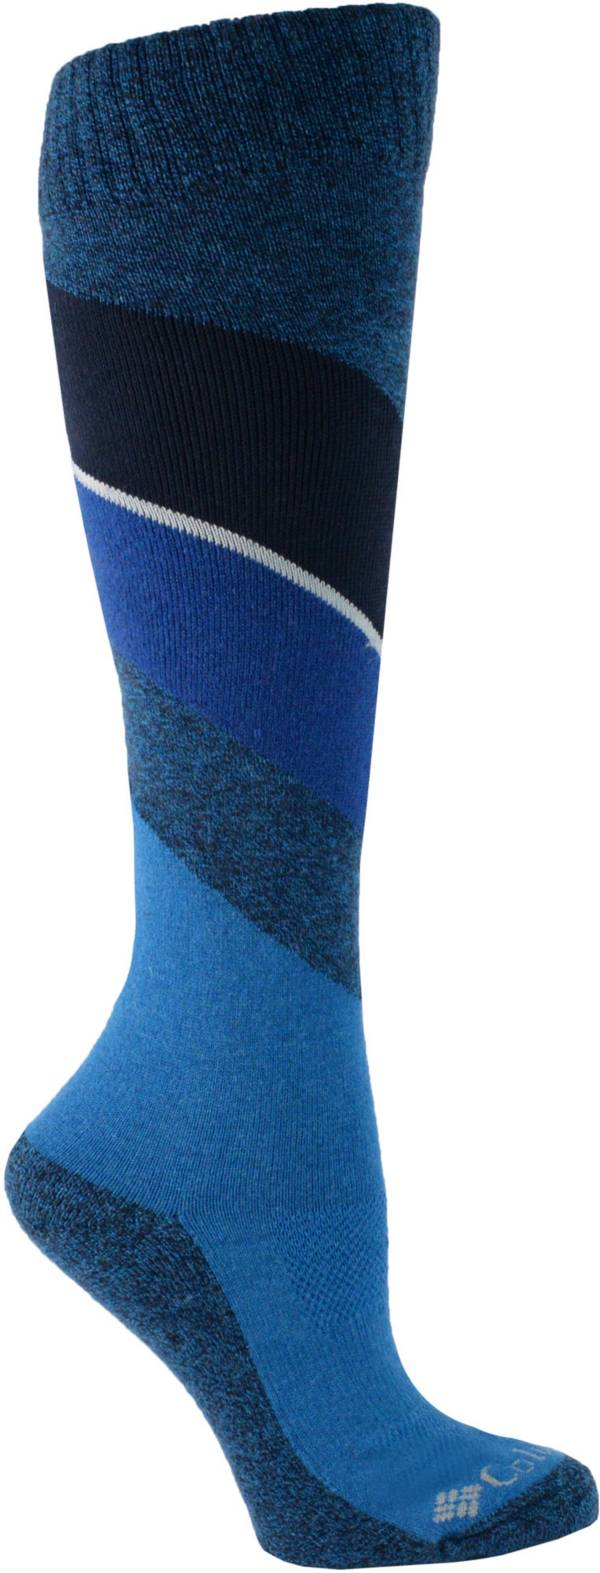 Columbia Adult On the Slope Over the Calf Ski Socks product image